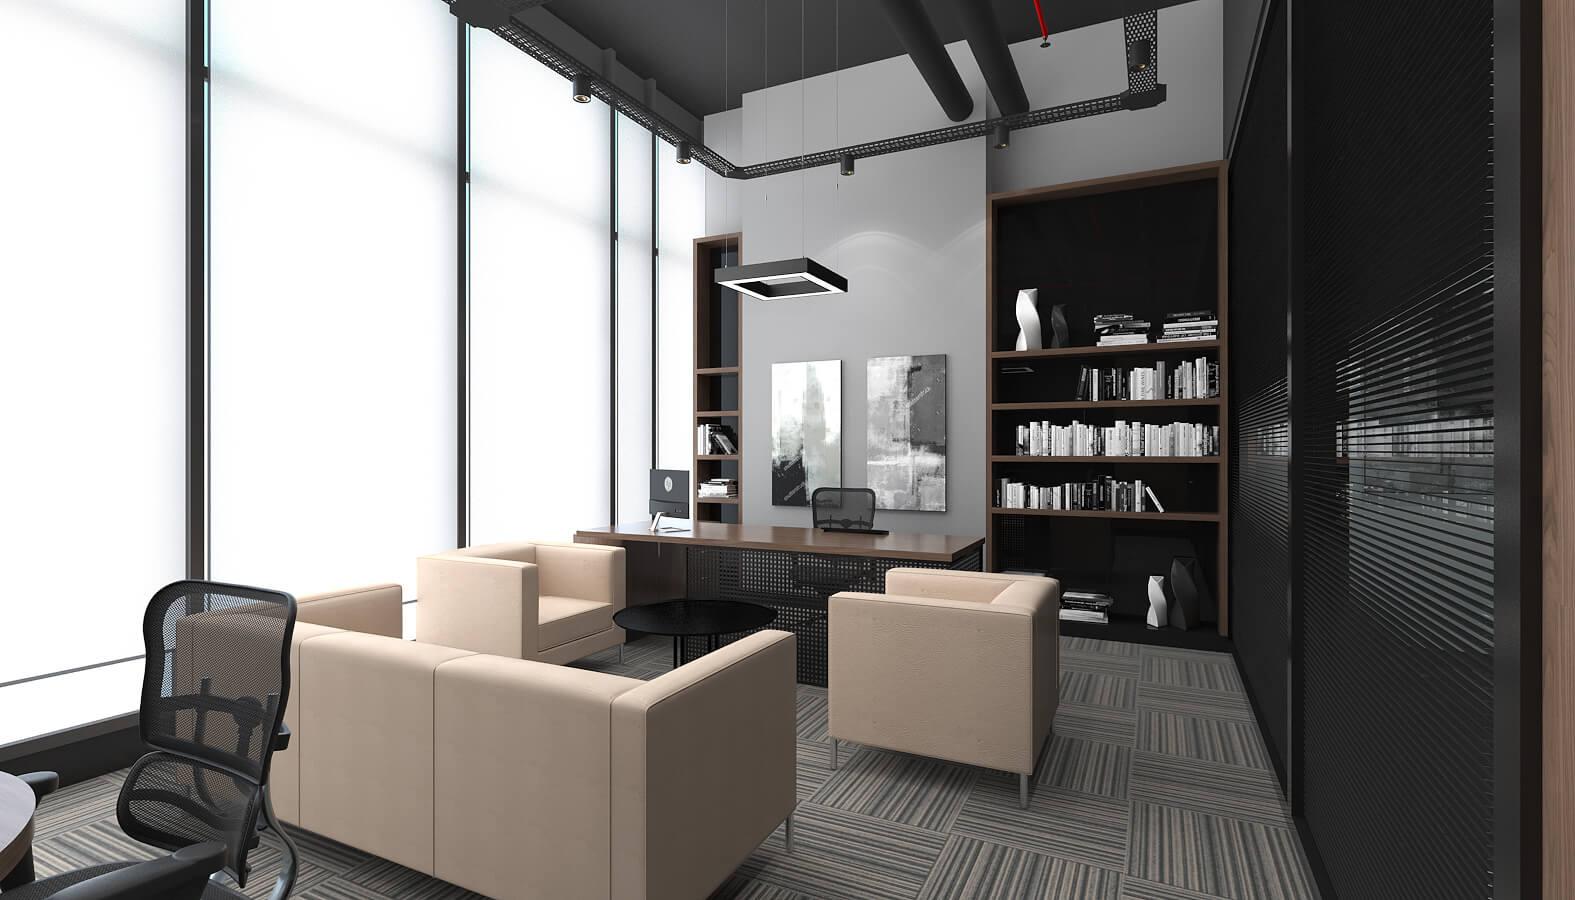 ofis mimari 3506 Ascan Maden Çimento Ofisler